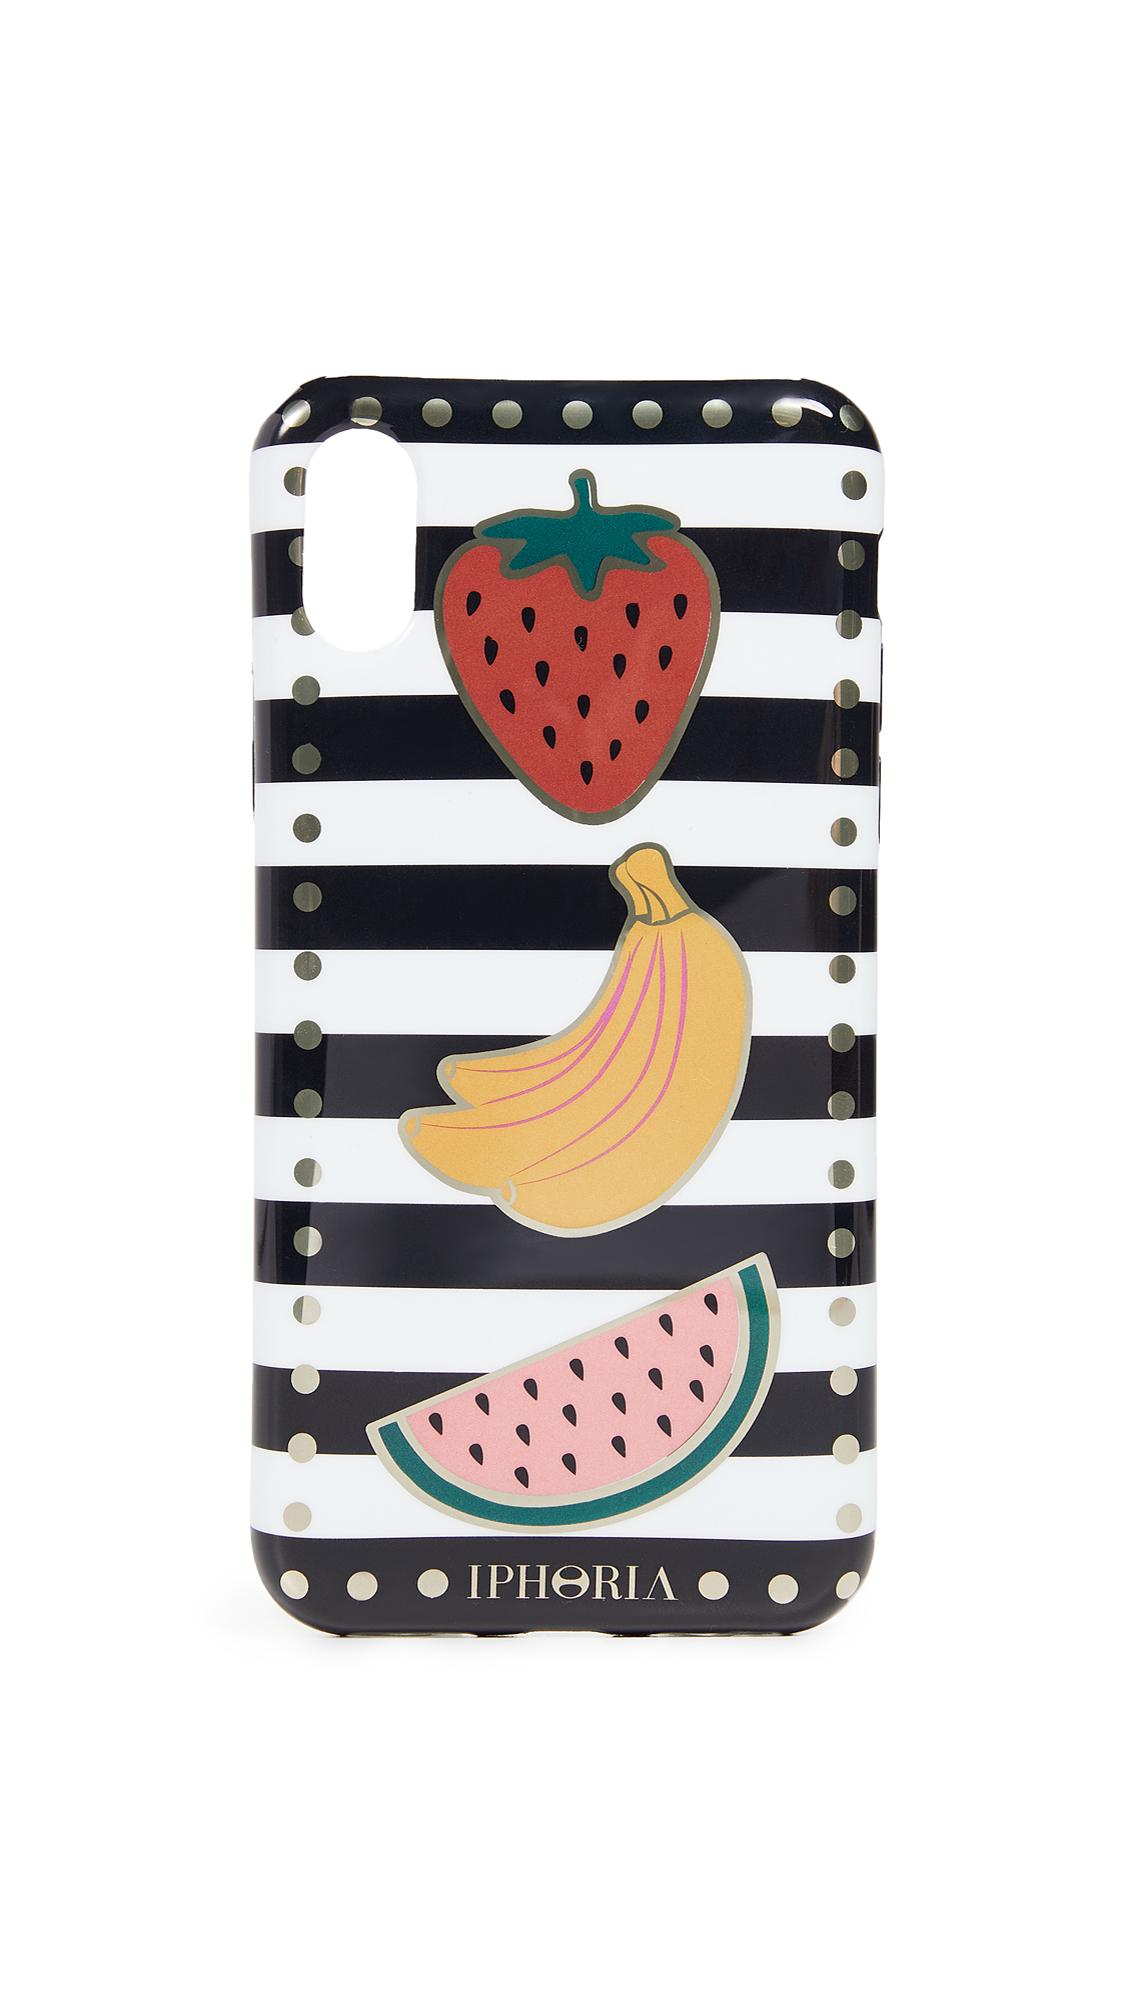 Iphoria Stripes with Fruits iPhone X Case - Black/White/Multi